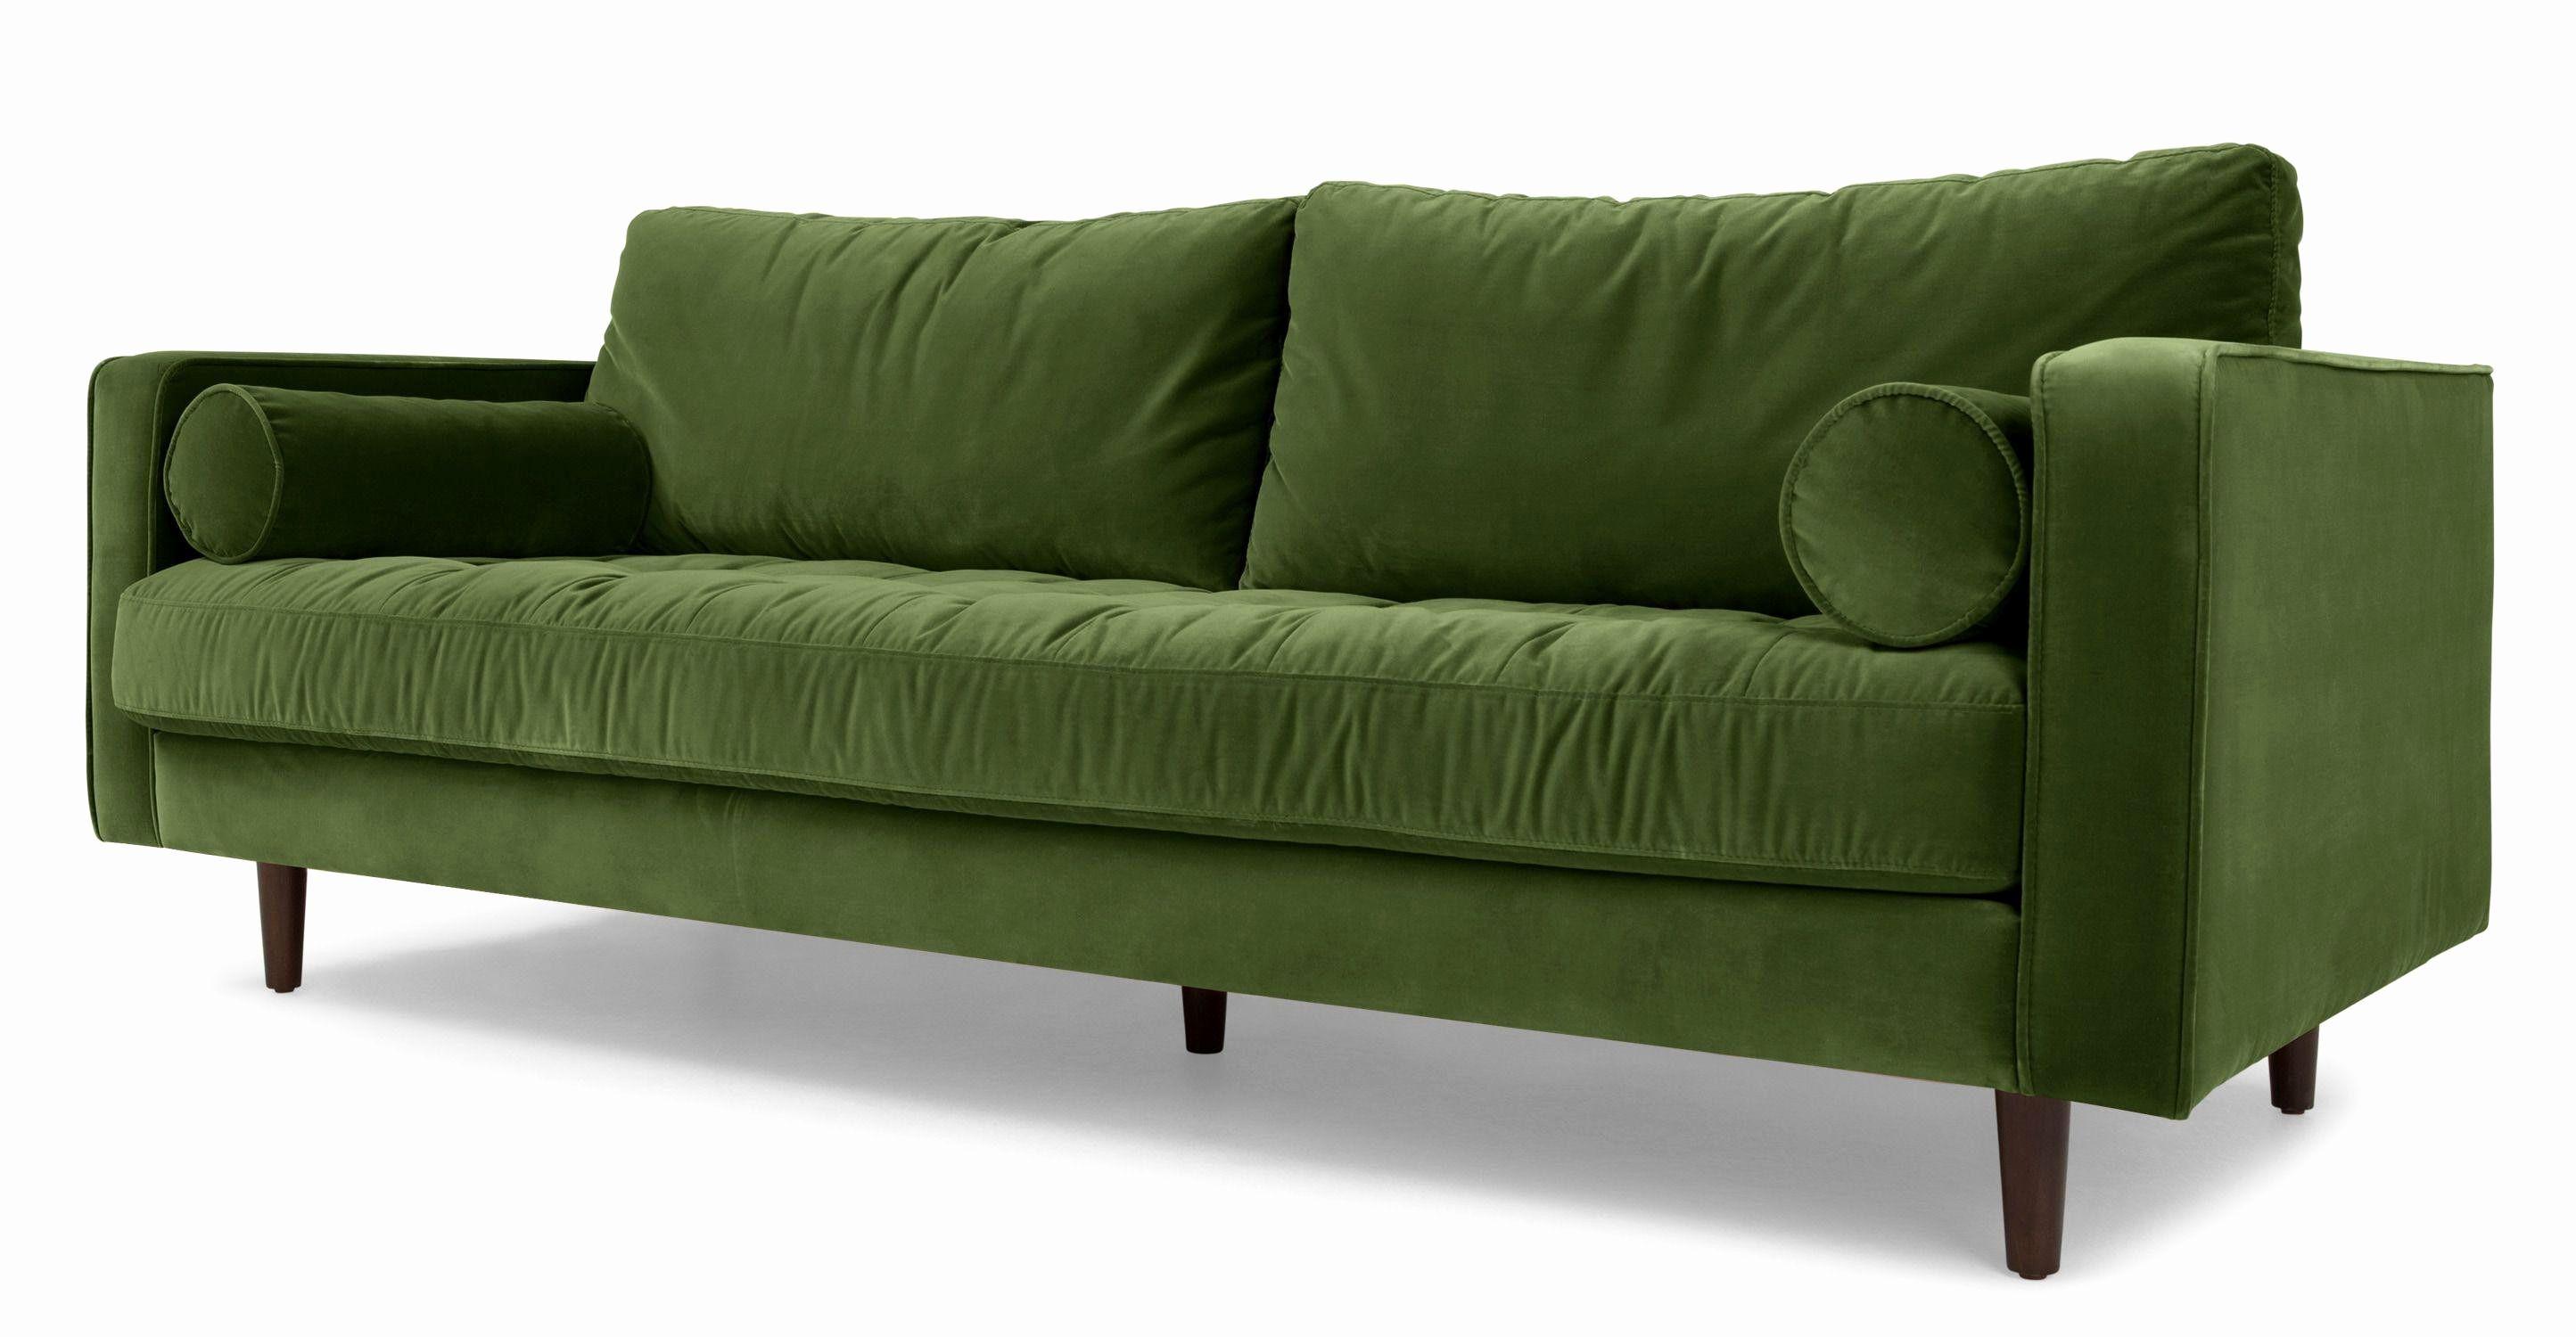 22 Schone Schlafsofa Beine Sofa Design Grunes Samtsofa